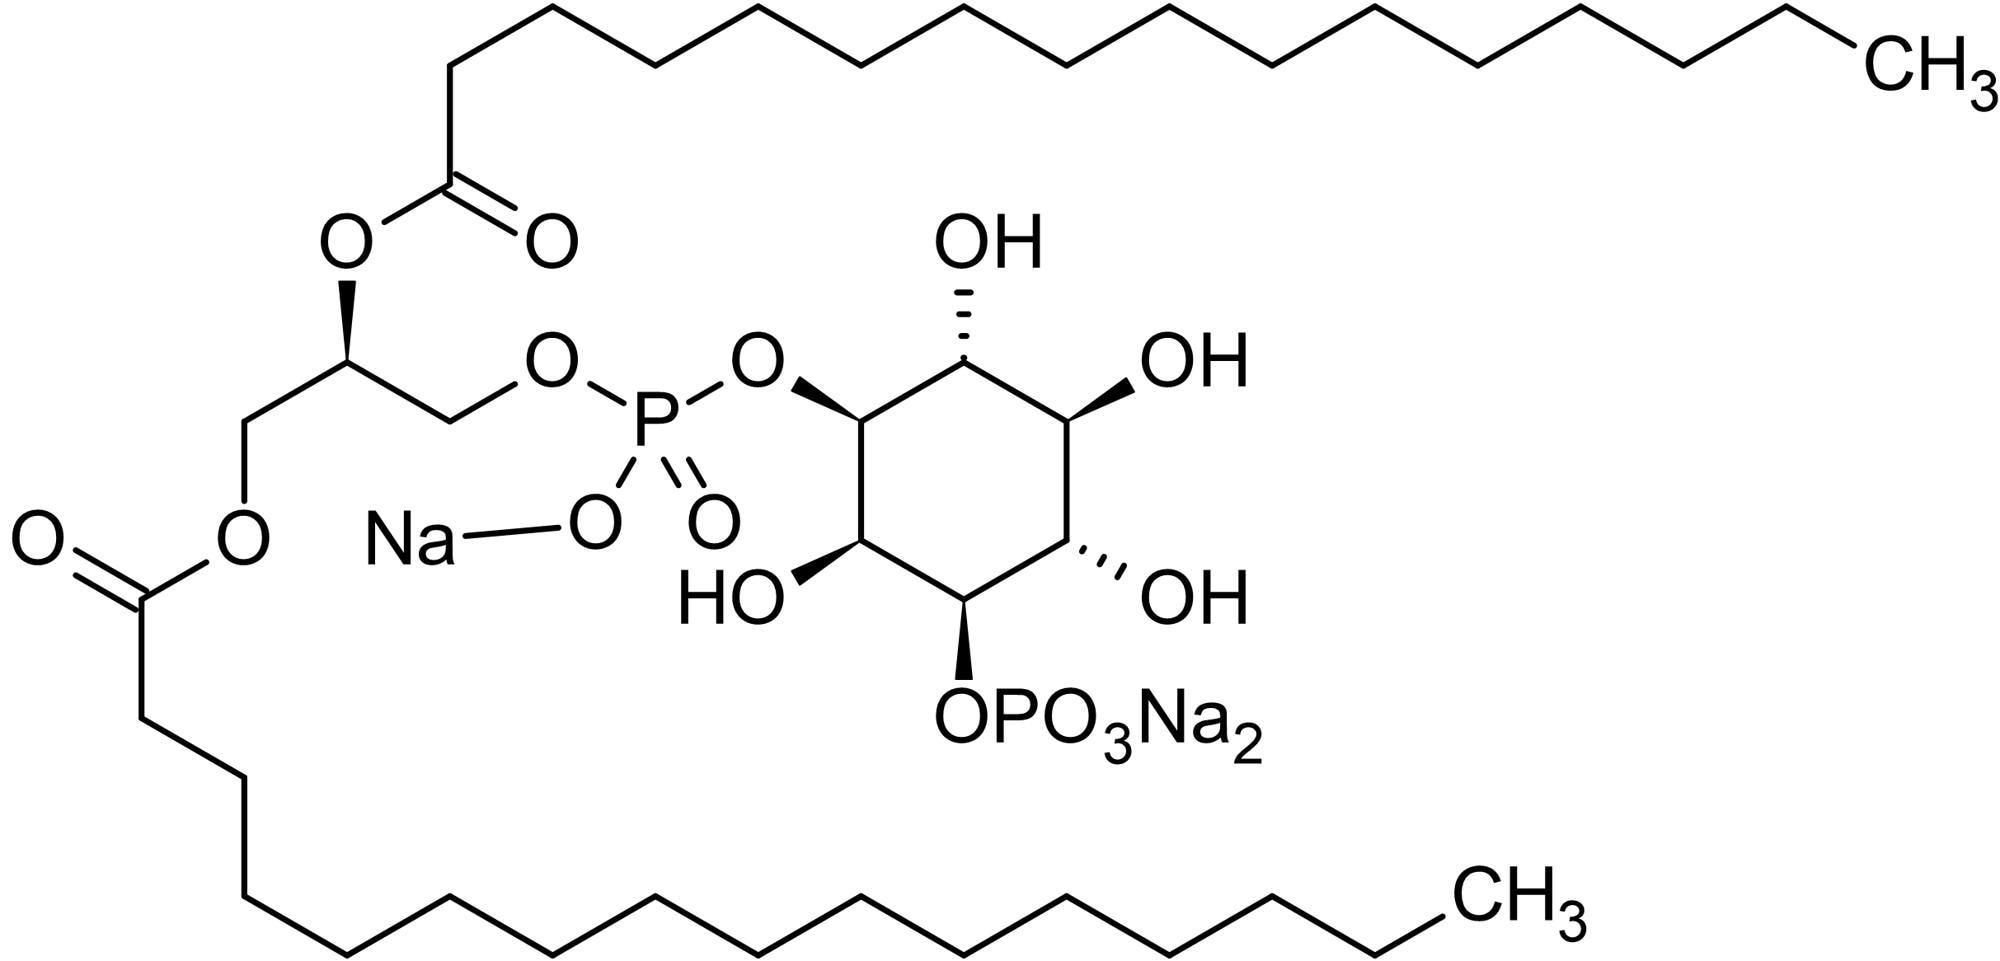 Chemical Structure - L-alpha-Phosphatidylinositol-3-phosphate sodium salt (ab145220)